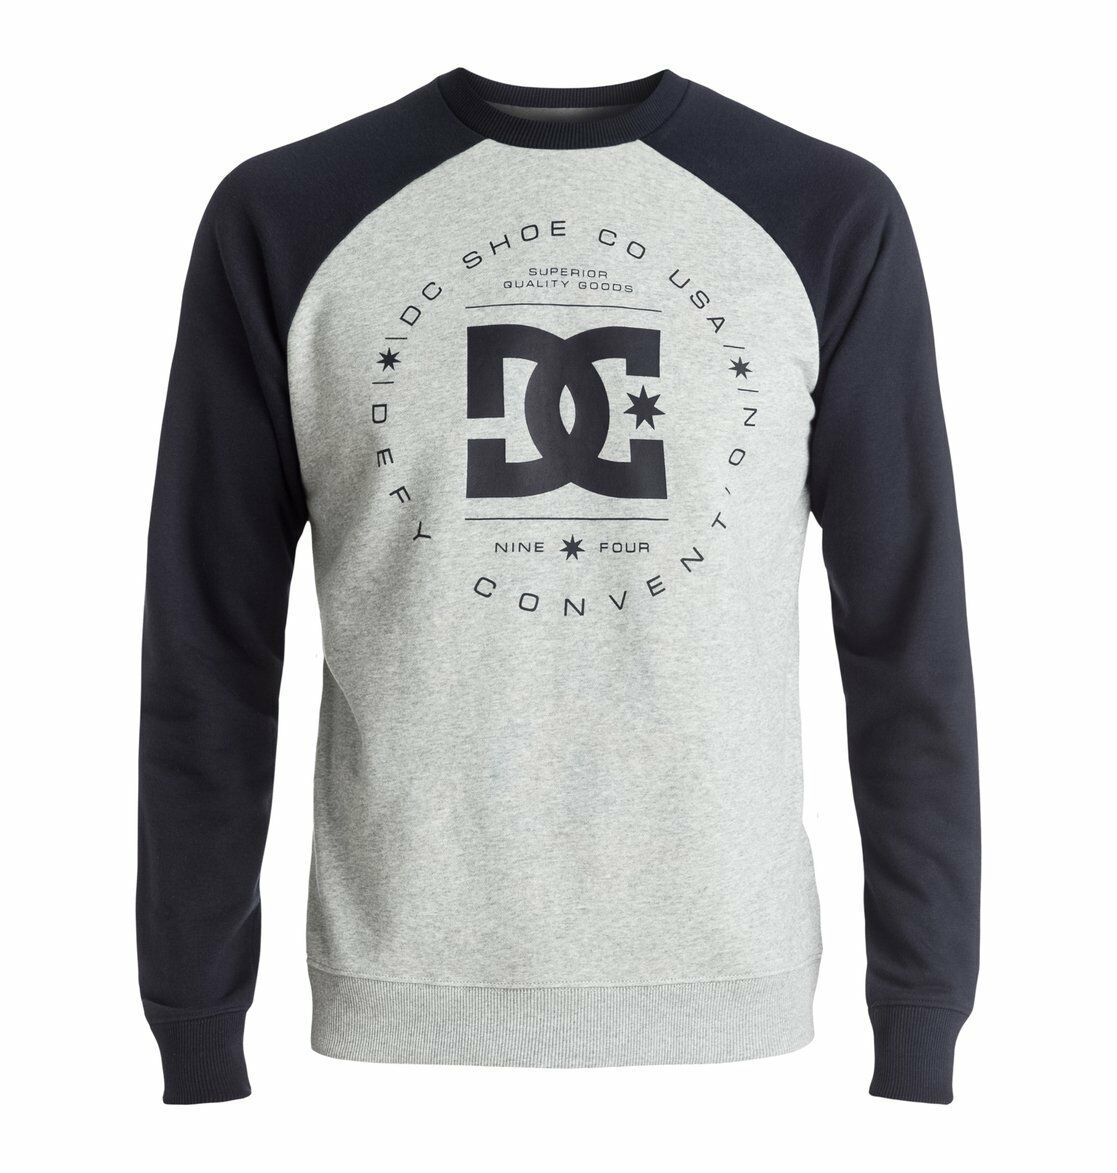 DC REBUILT CREW RAGLAN adult - Sweatshirt  CLEARANCE DARK INDIGO HEATHER GREY LG